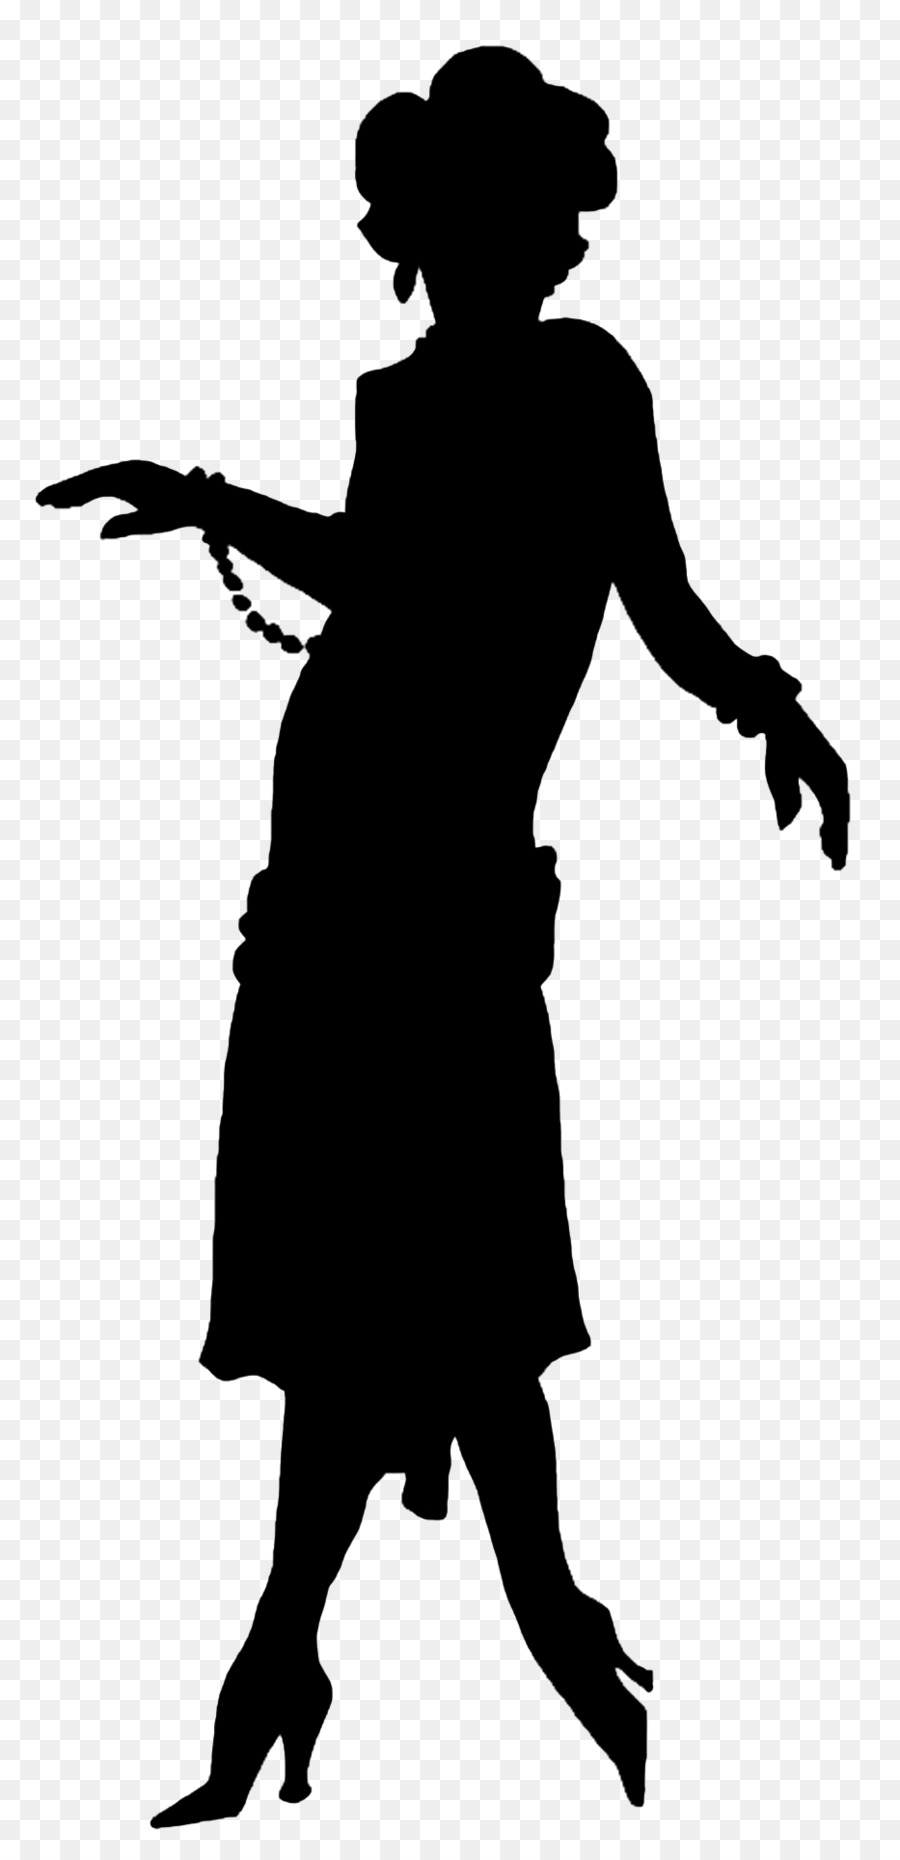 1920s silhouette clip art the incredibles png download 933 1927 rh kisspng com 1920s car clipart 1940s clip art free